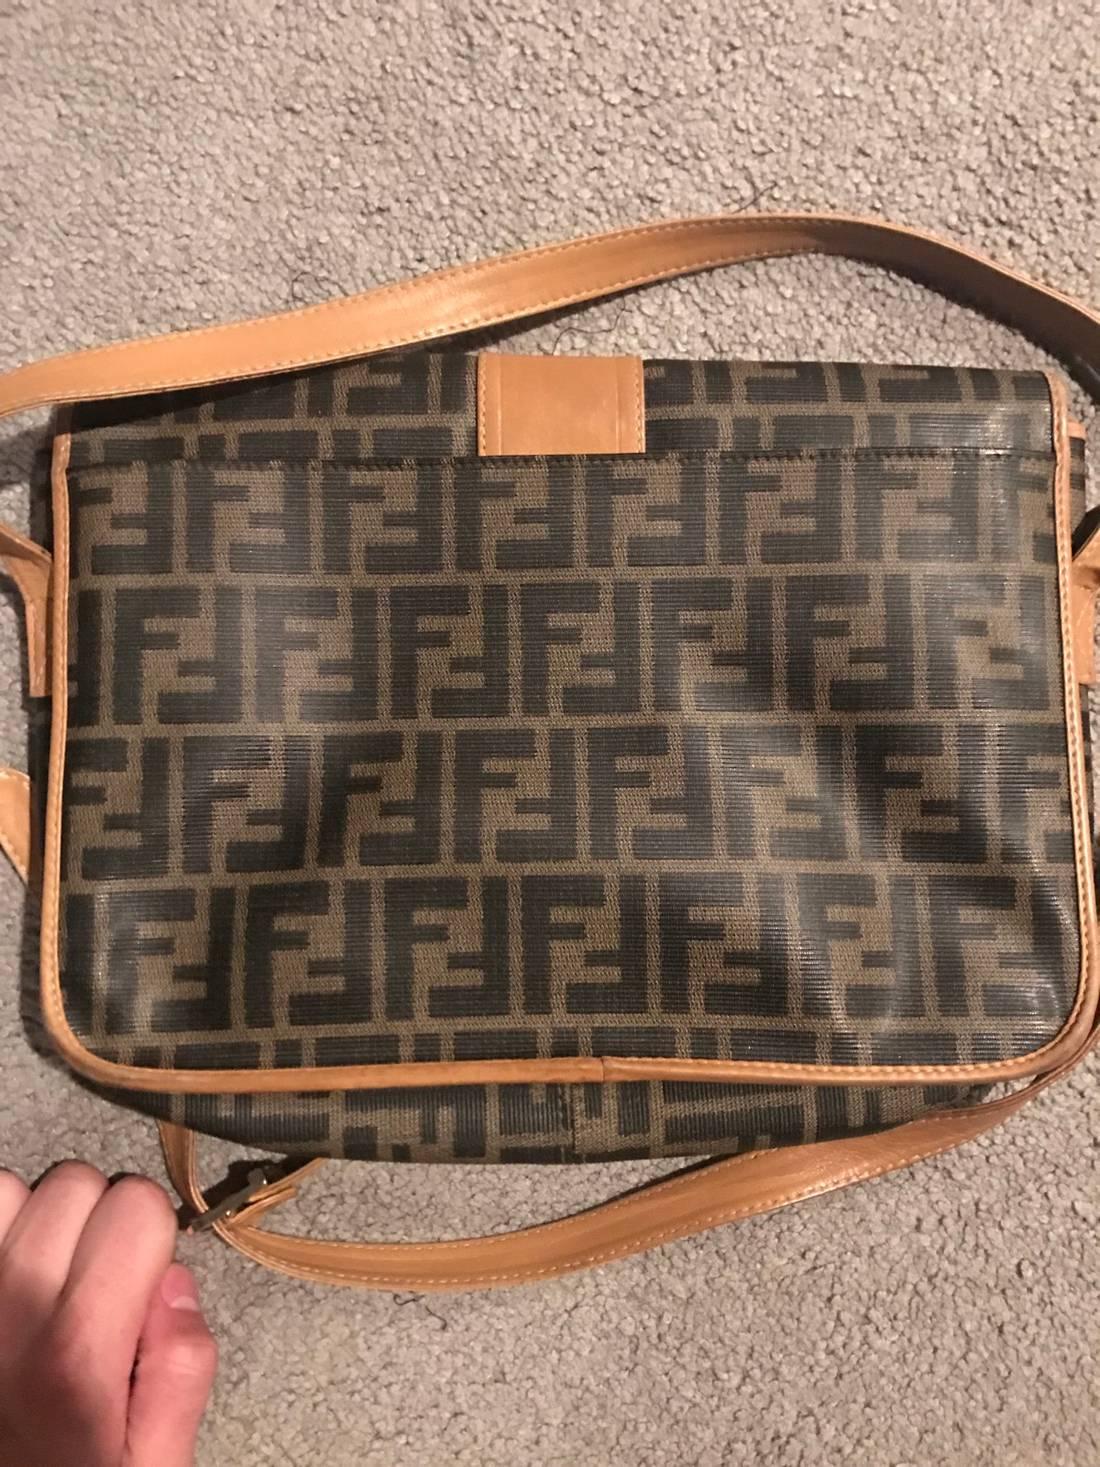 ireland fendi handbag vintage leather messenger 6c455 c76ec c643f1f344